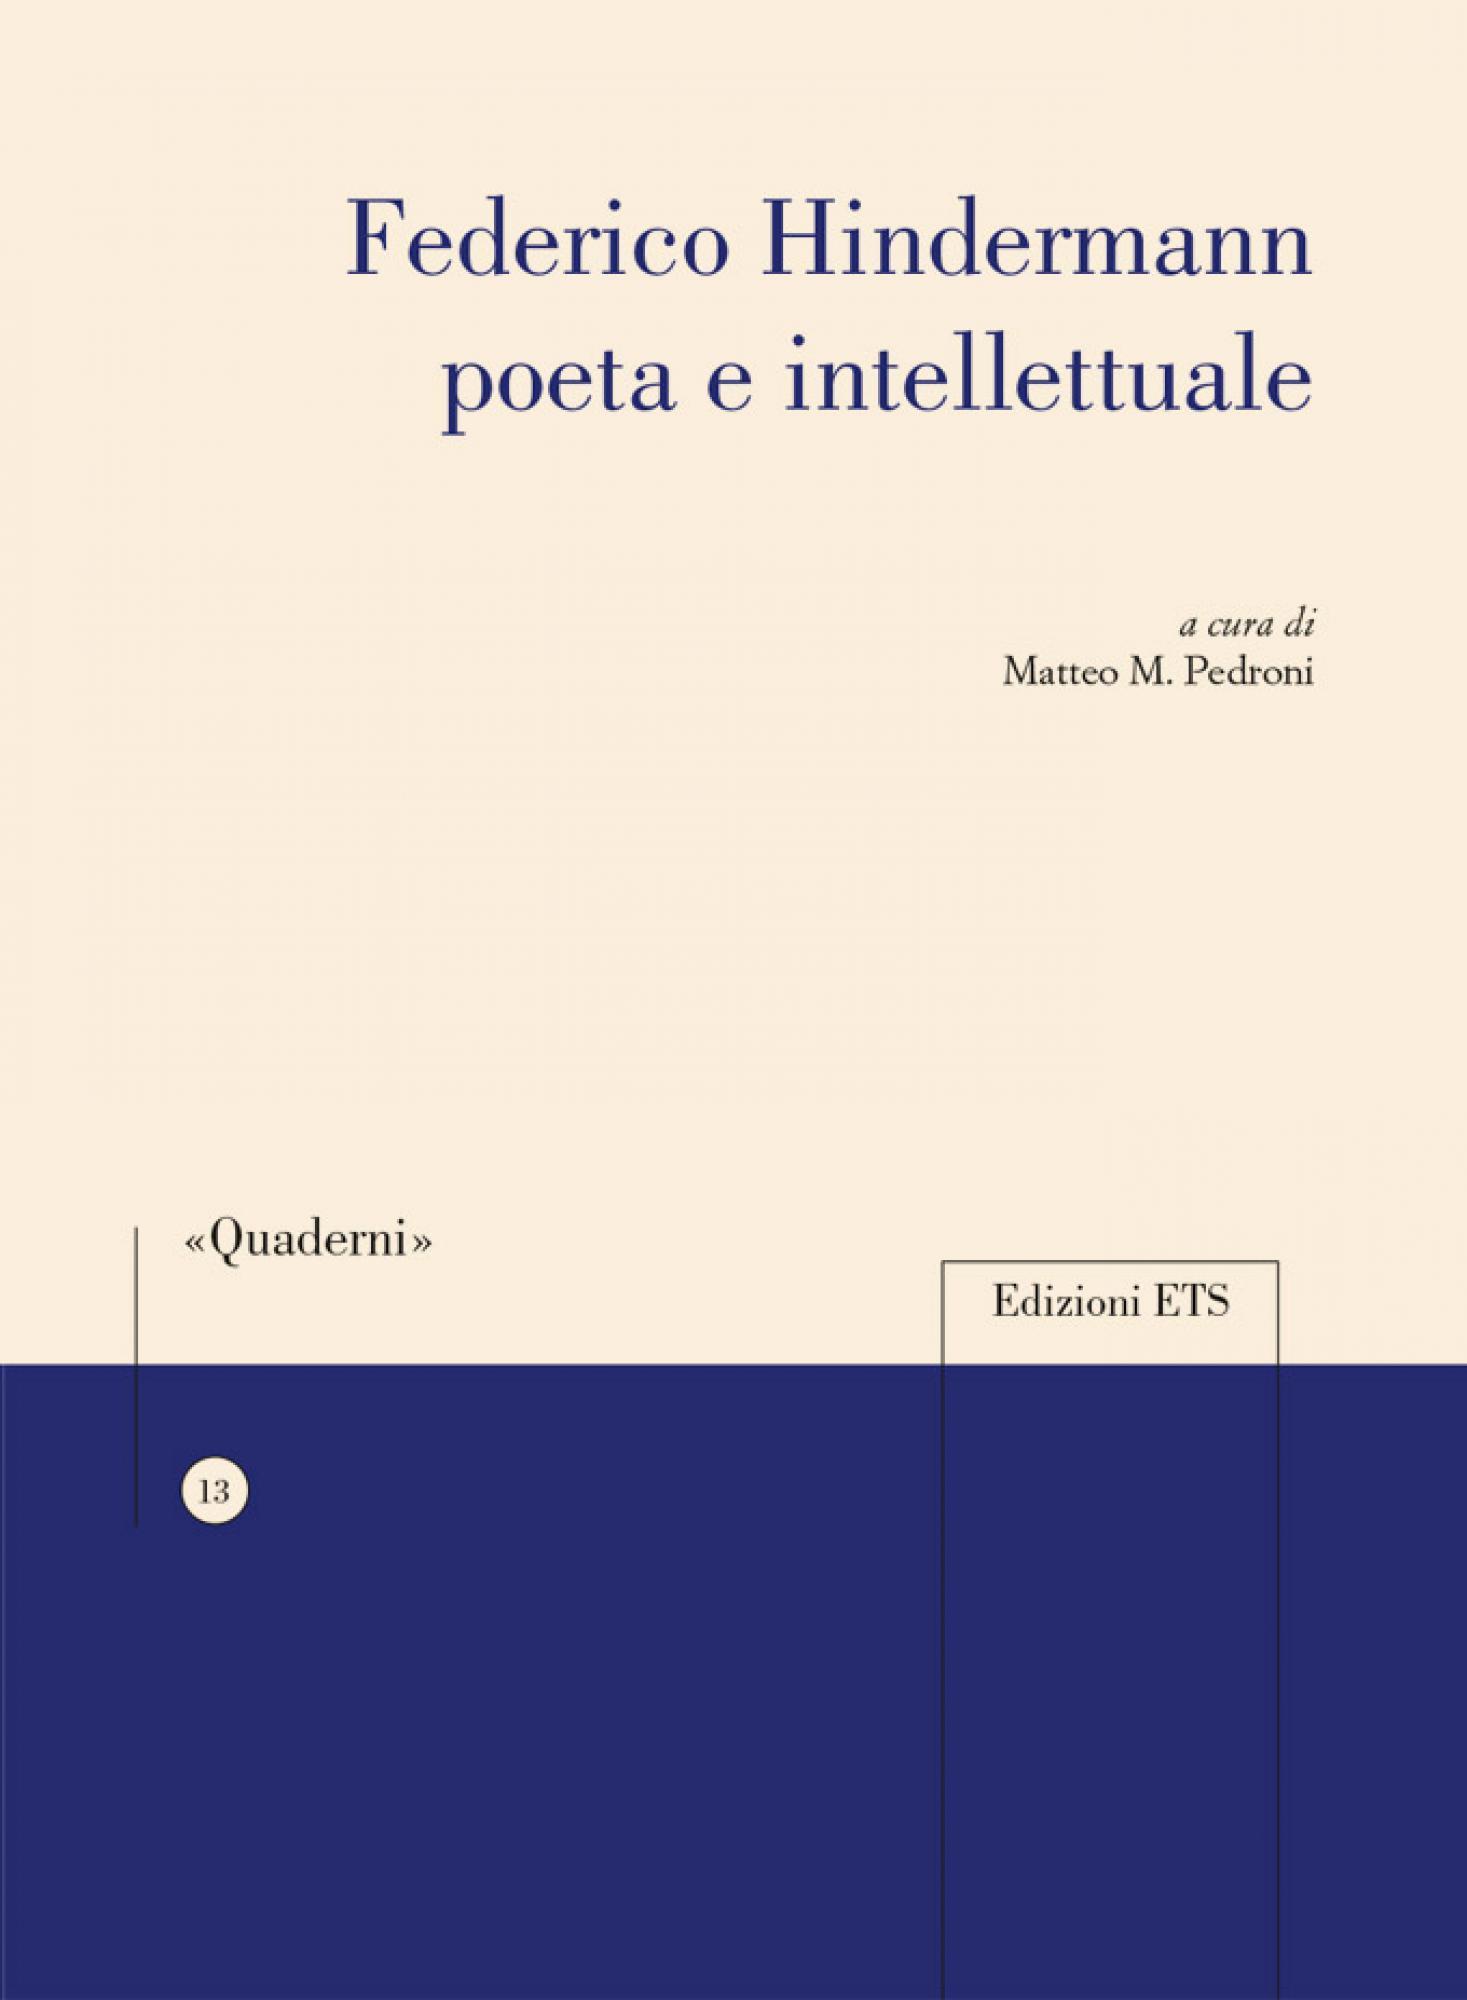 Federico Hindermann poeta e intellettuale